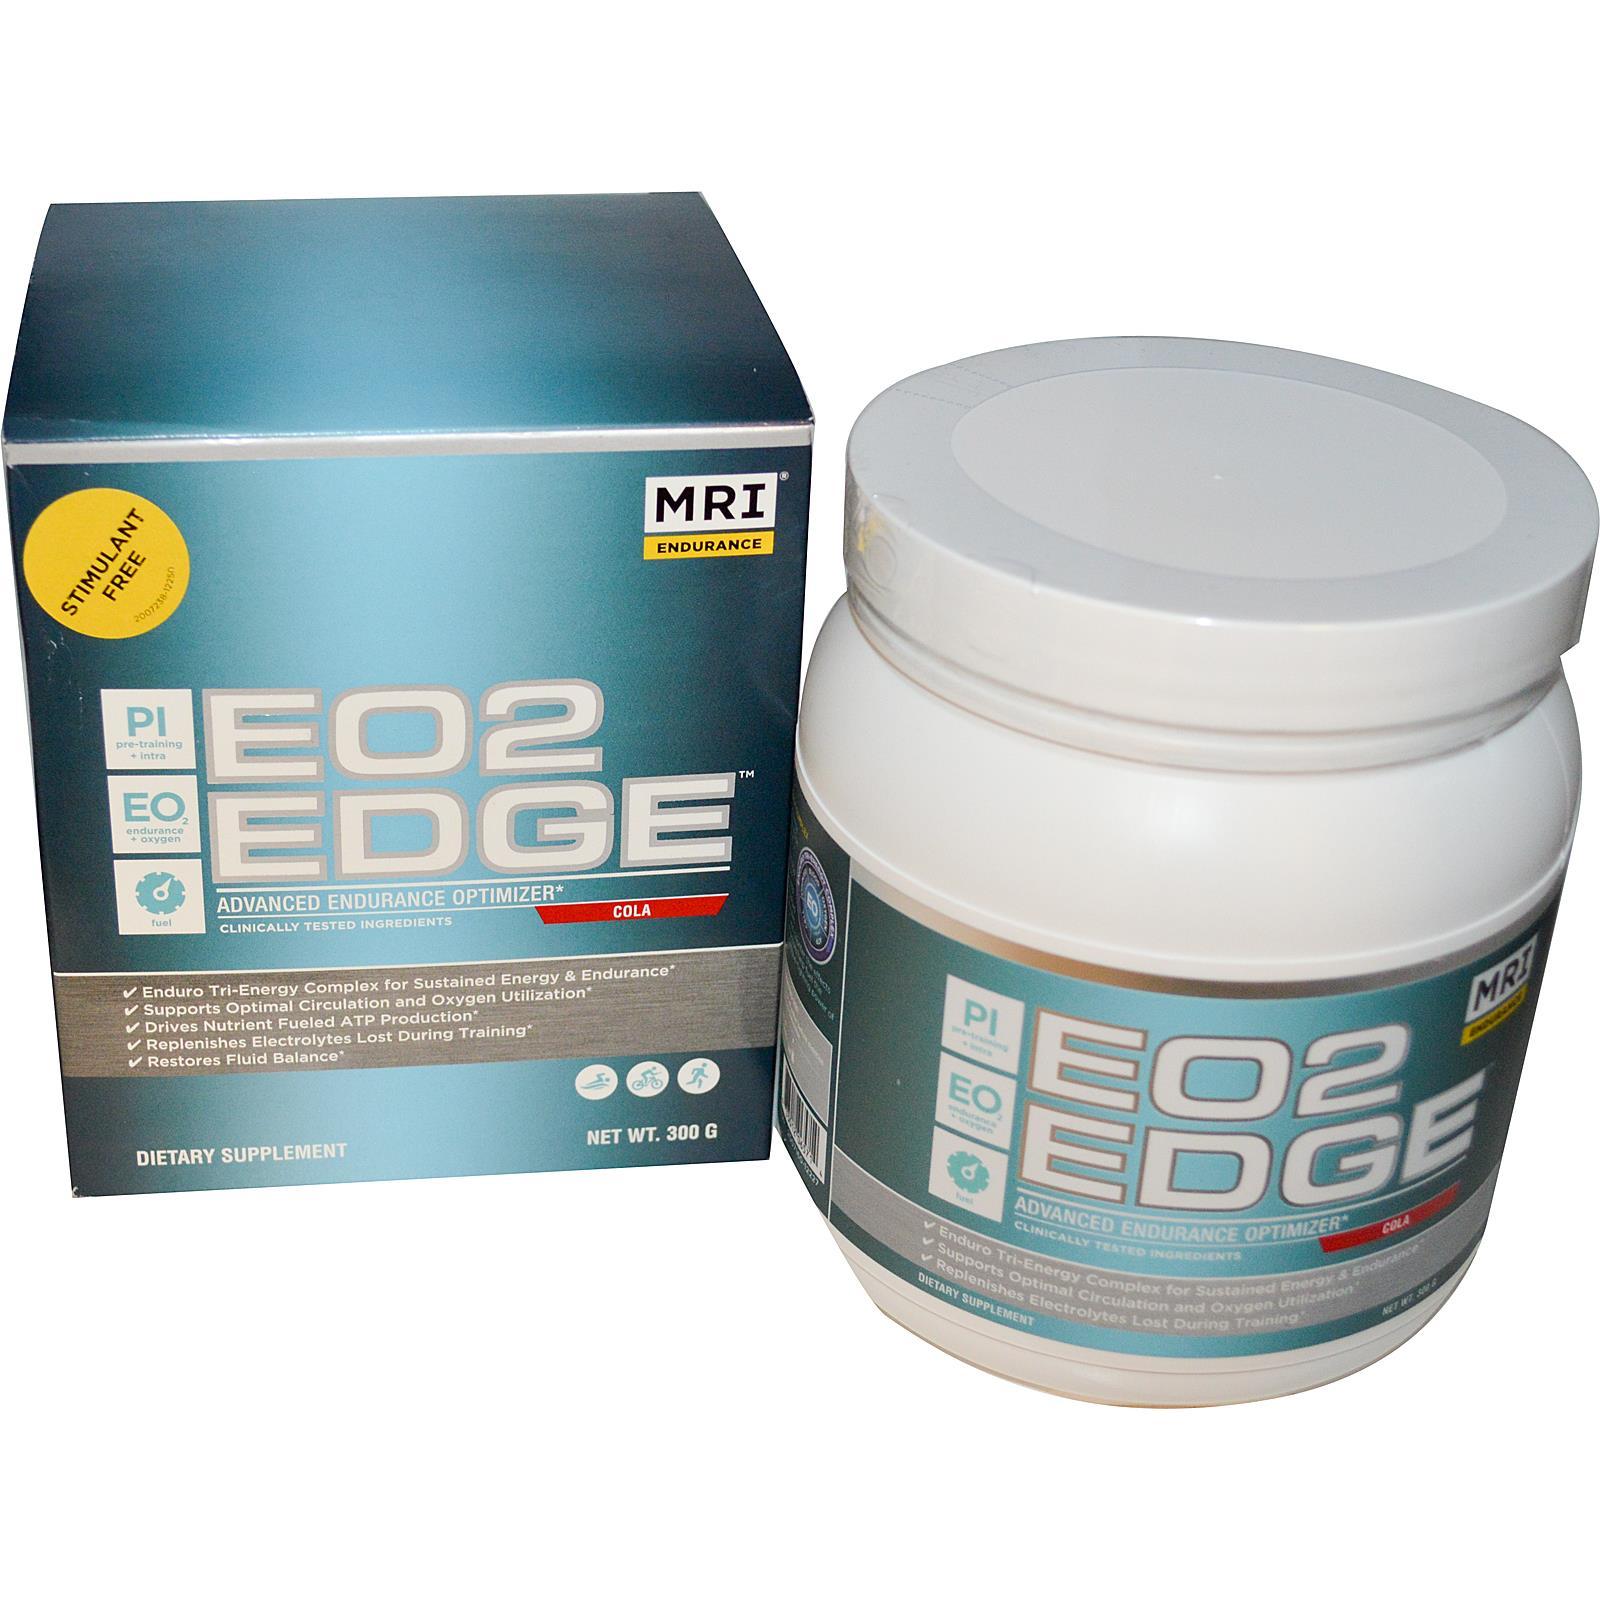 MRI Perfomance EO2 EDGE